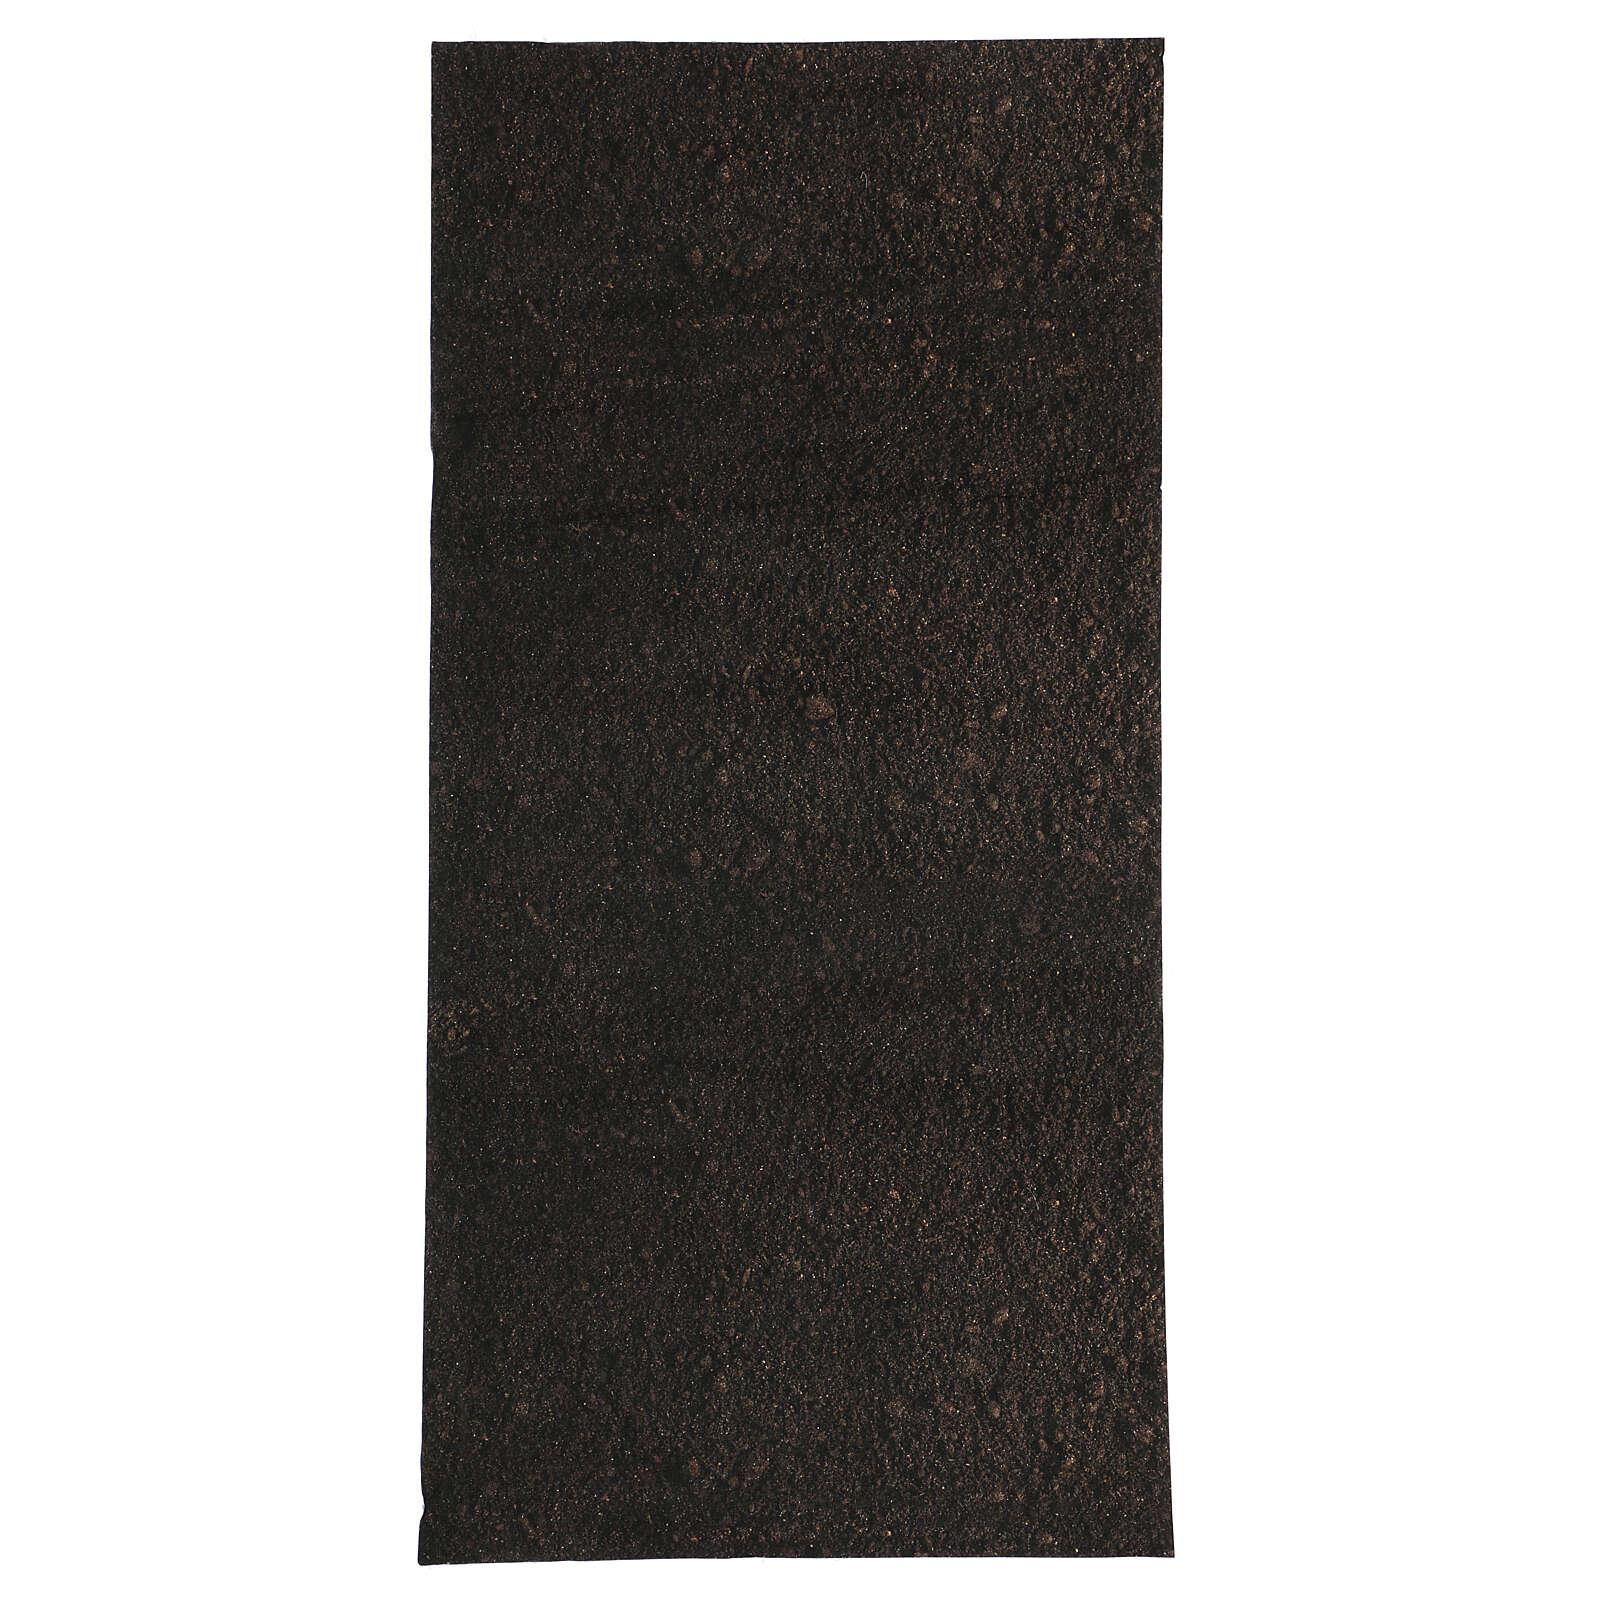 Nativity backdrop paper, dirt 60x30 cm 4